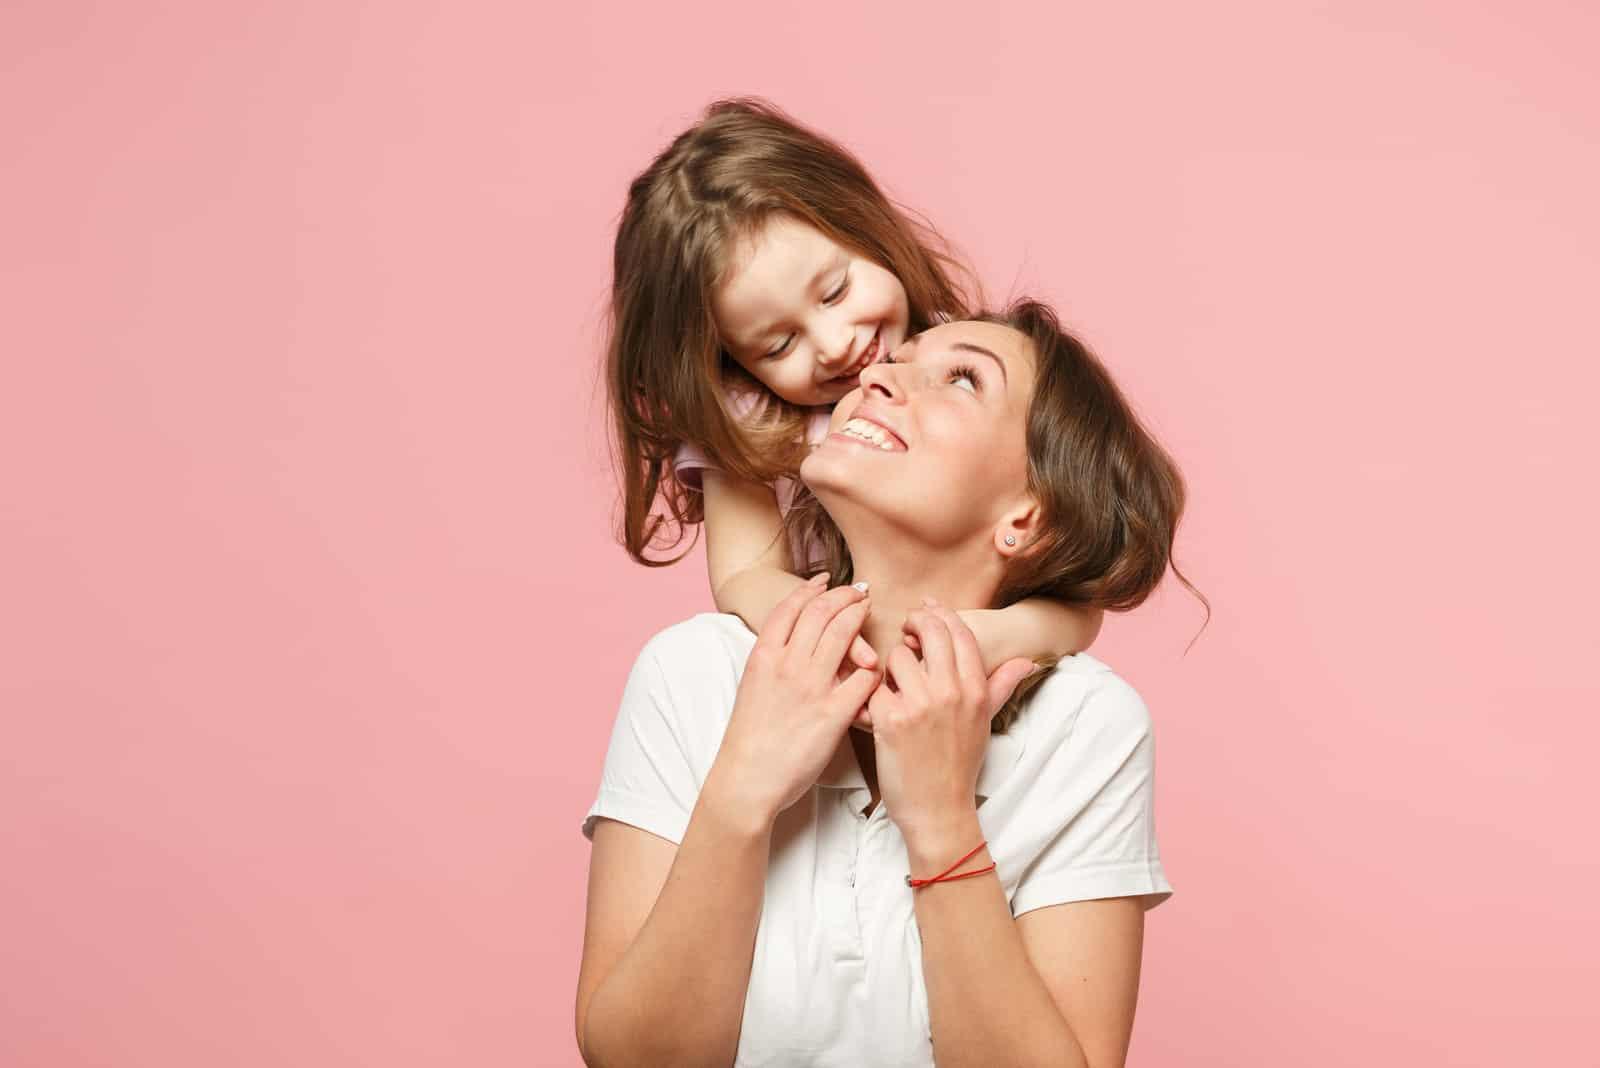 fille embrasse maman et rit